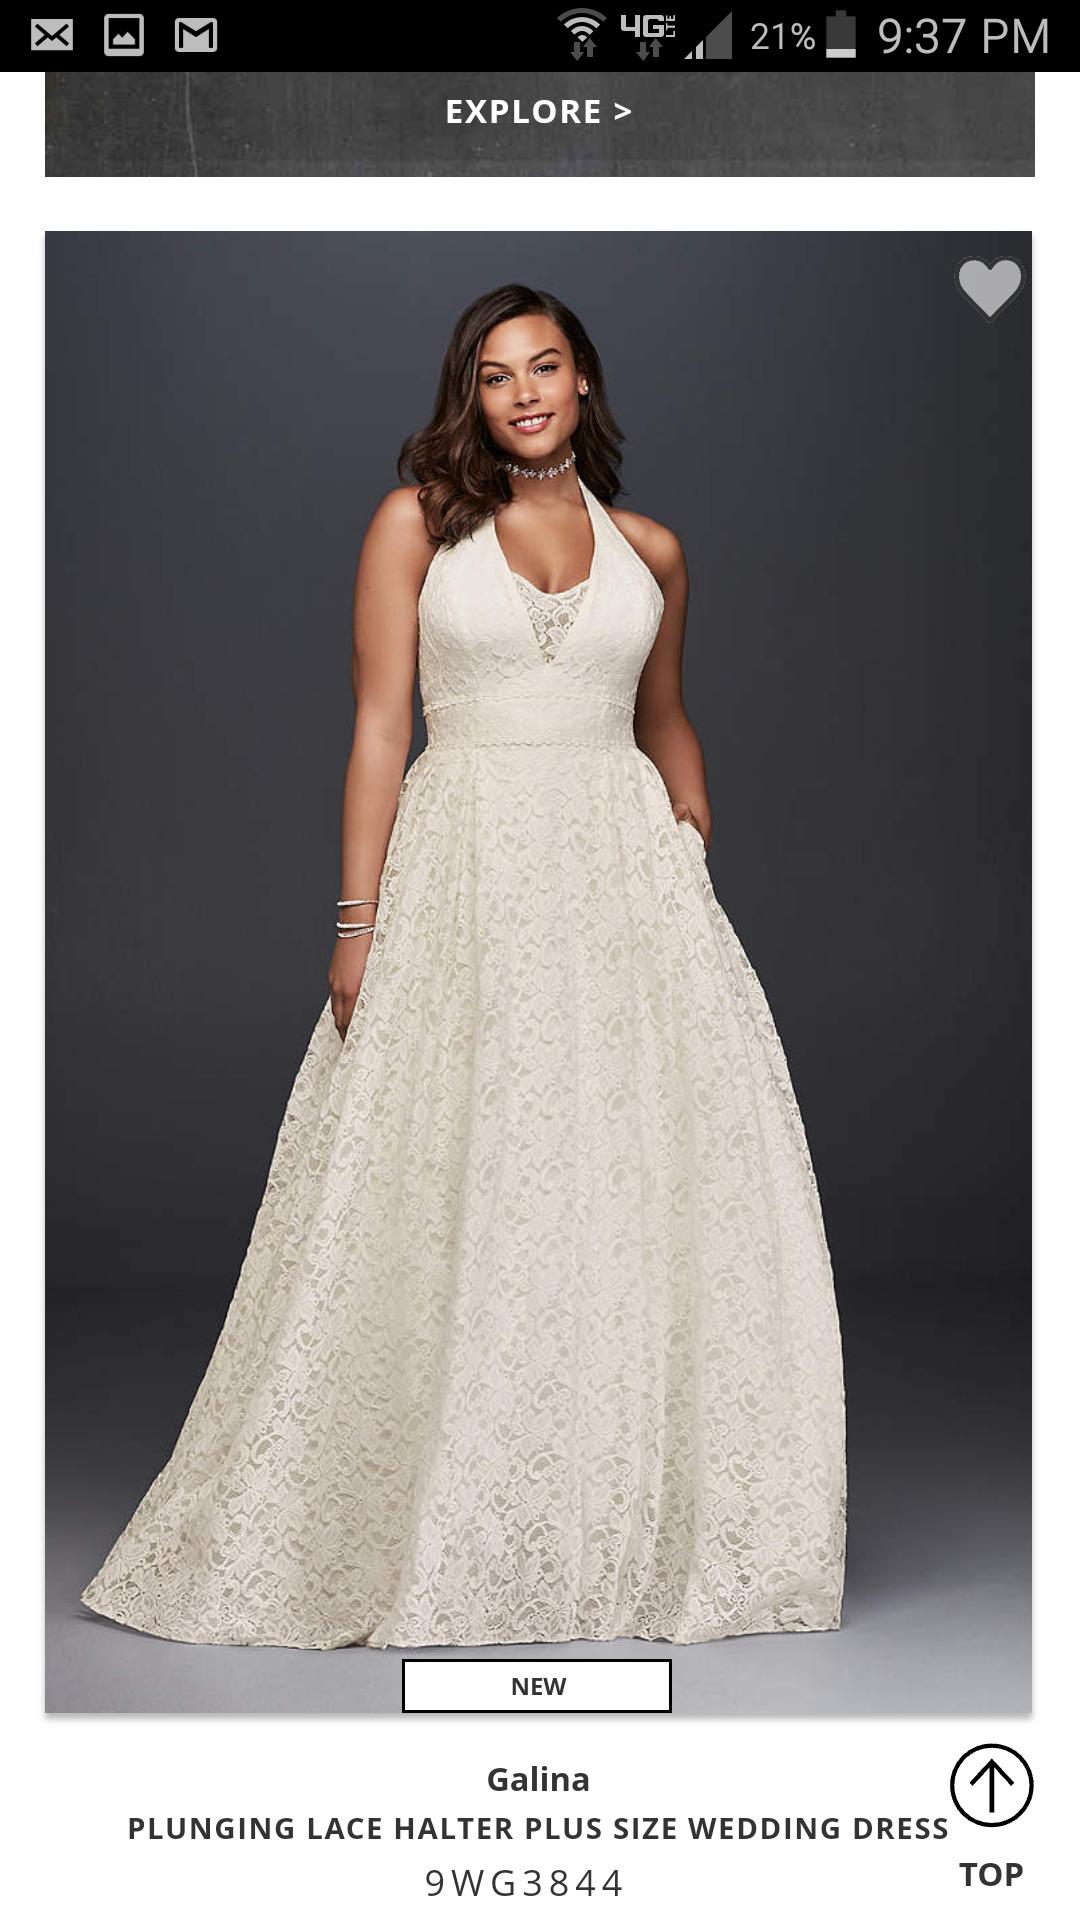 Pin by Haley Stuart on Wedding Dresses  Pinterest